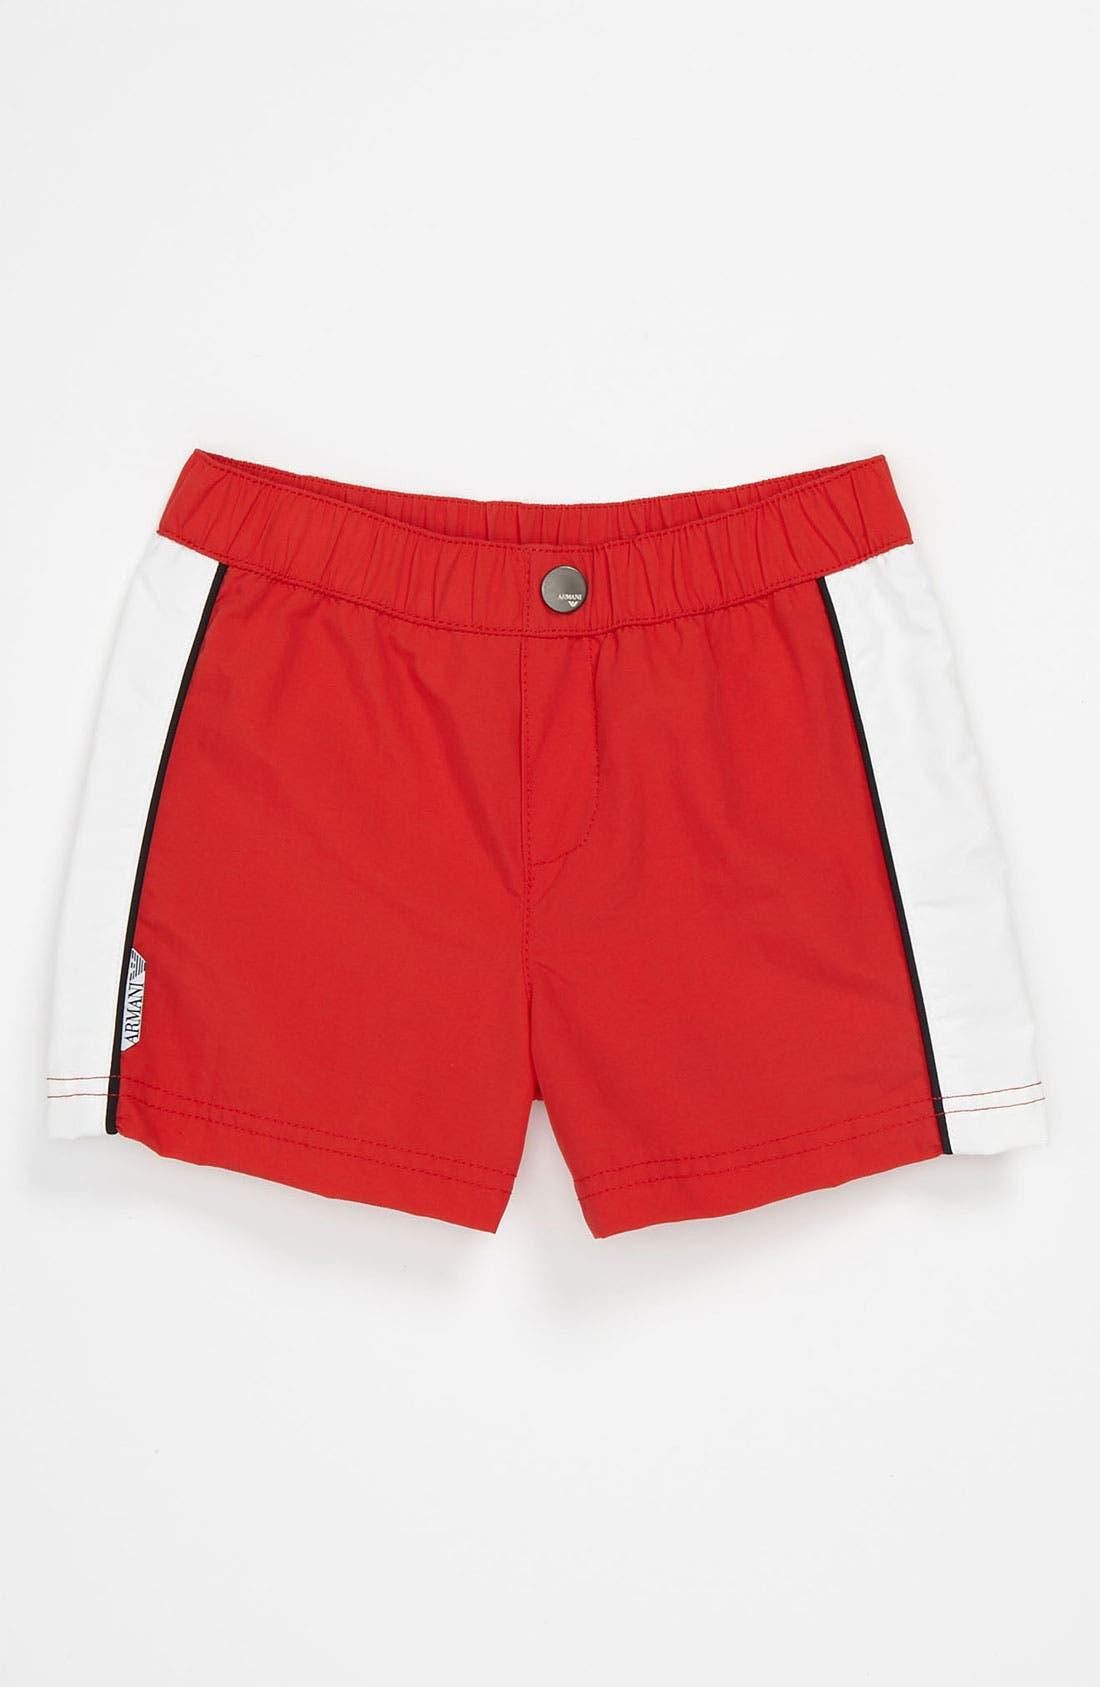 Main Image - Armani Junior Swim Trunks (Baby)